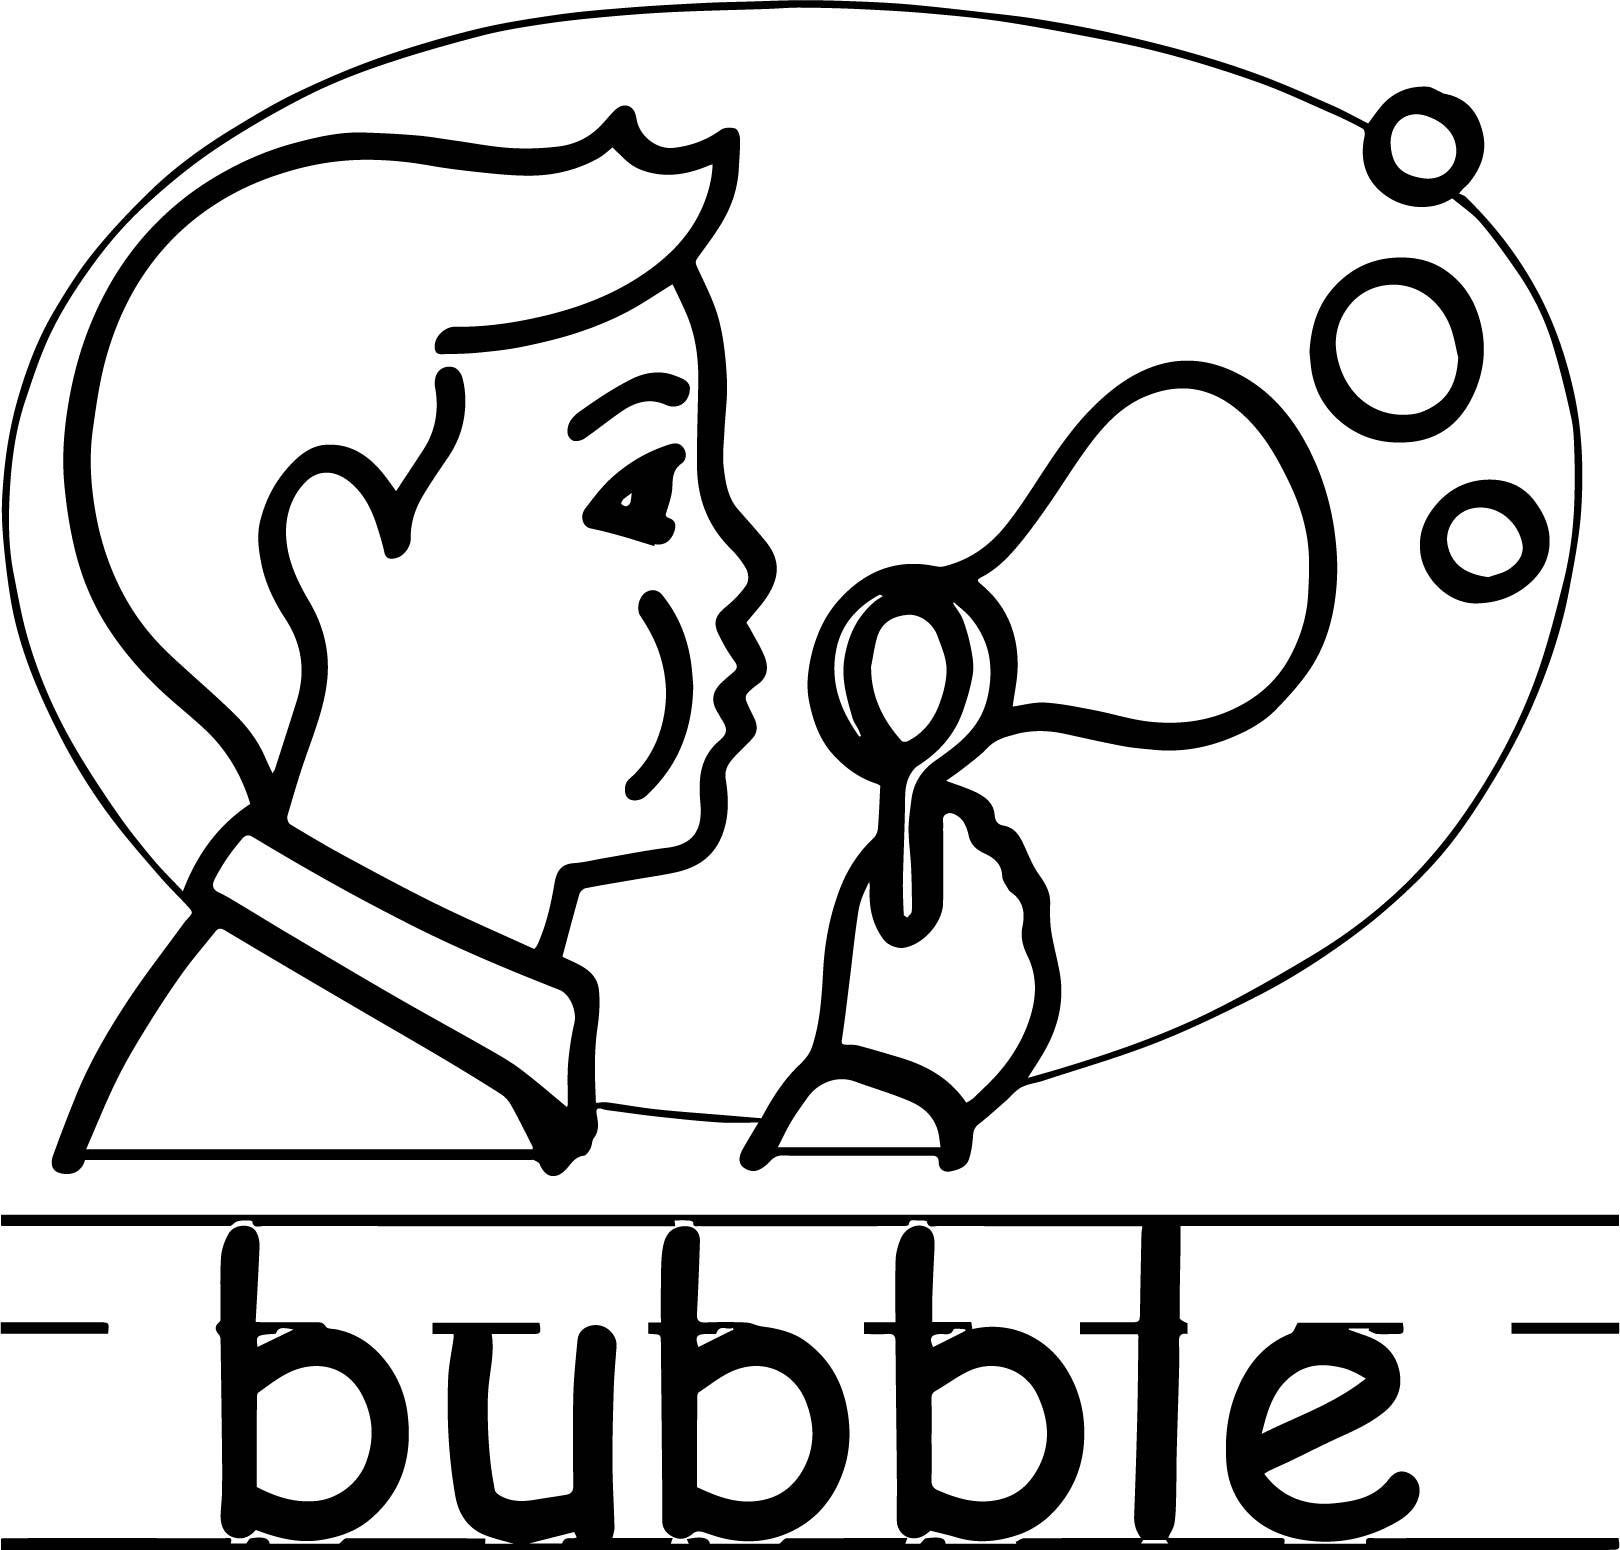 Bubble Abc Teach Coloring Page